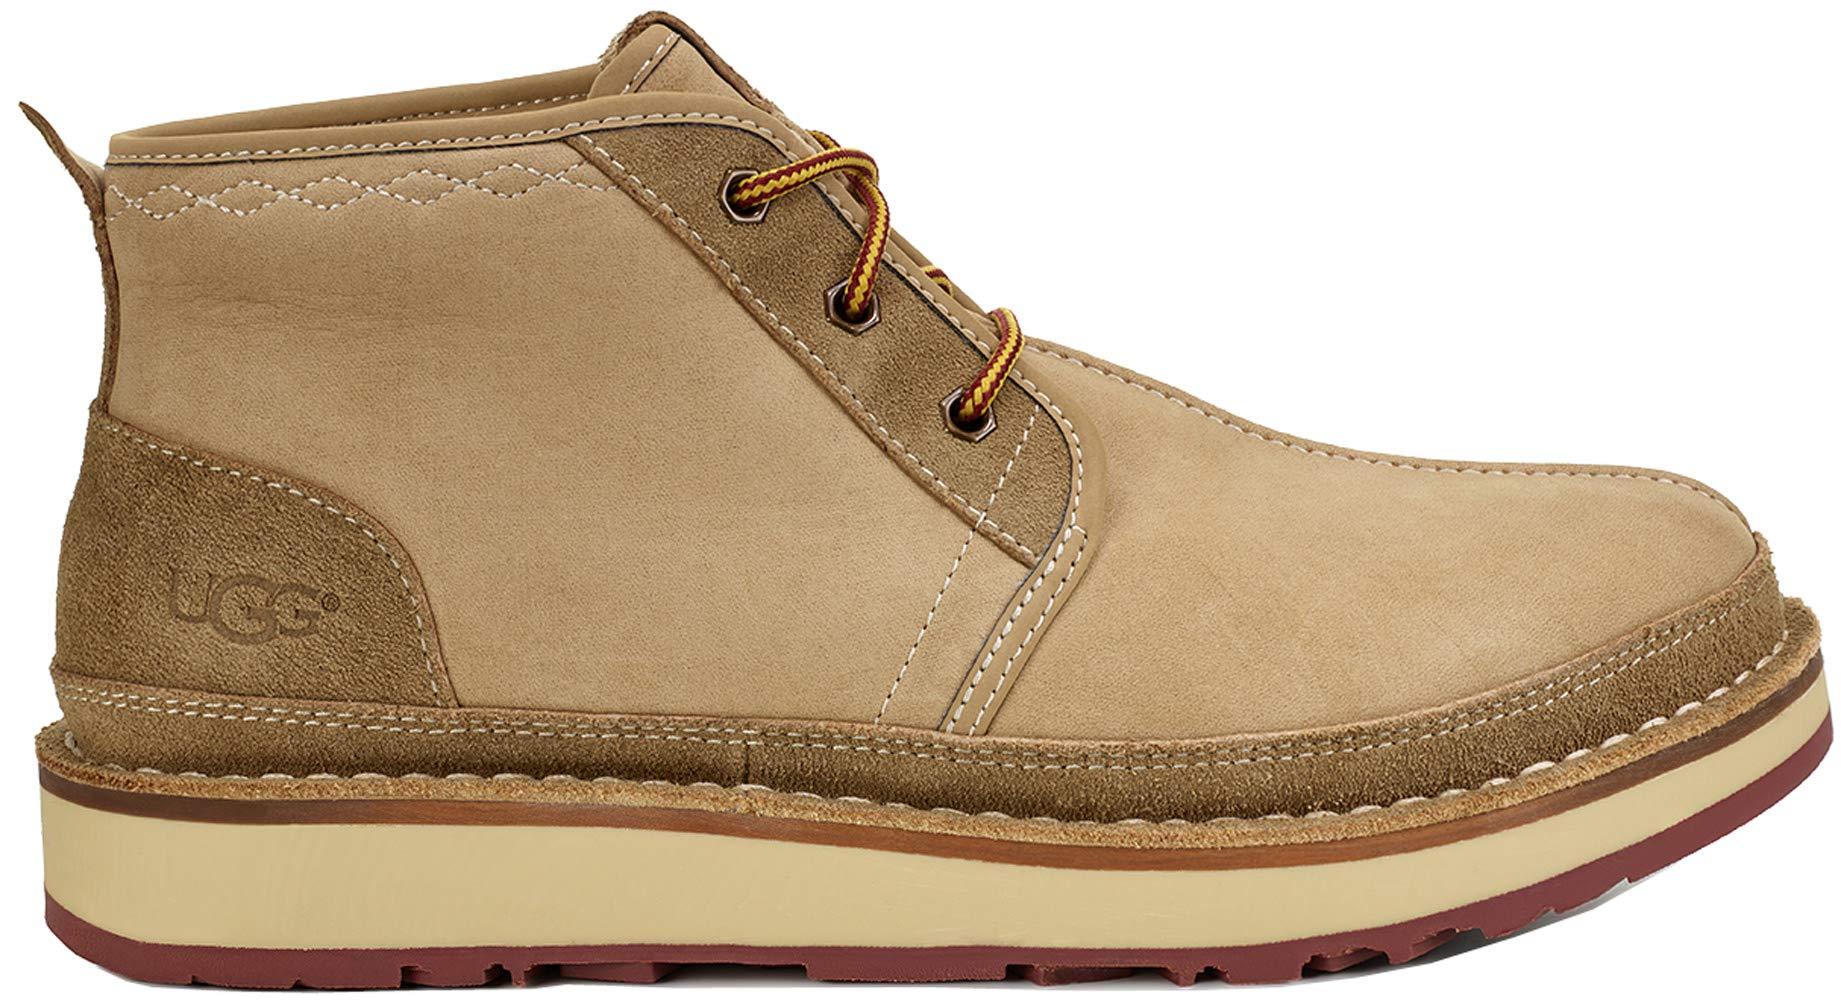 UGG Mens Avalanche Neumel Boot, Desert Tan, Size 13